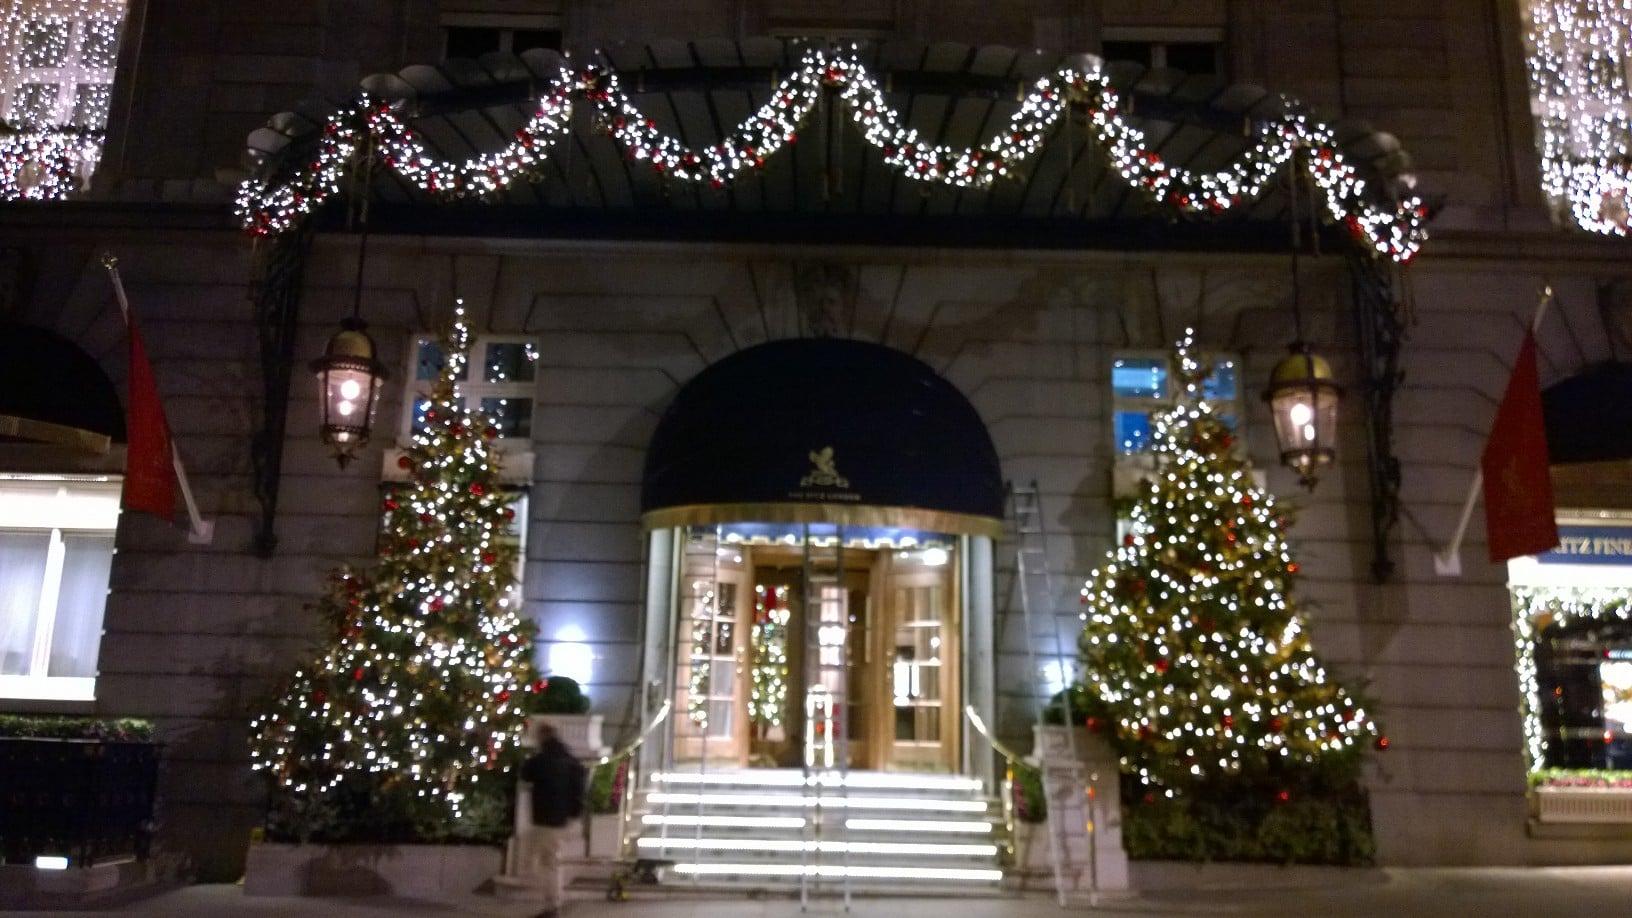 Christmas At The Ritz London.The Ritz London Radiant Blinds Ltd